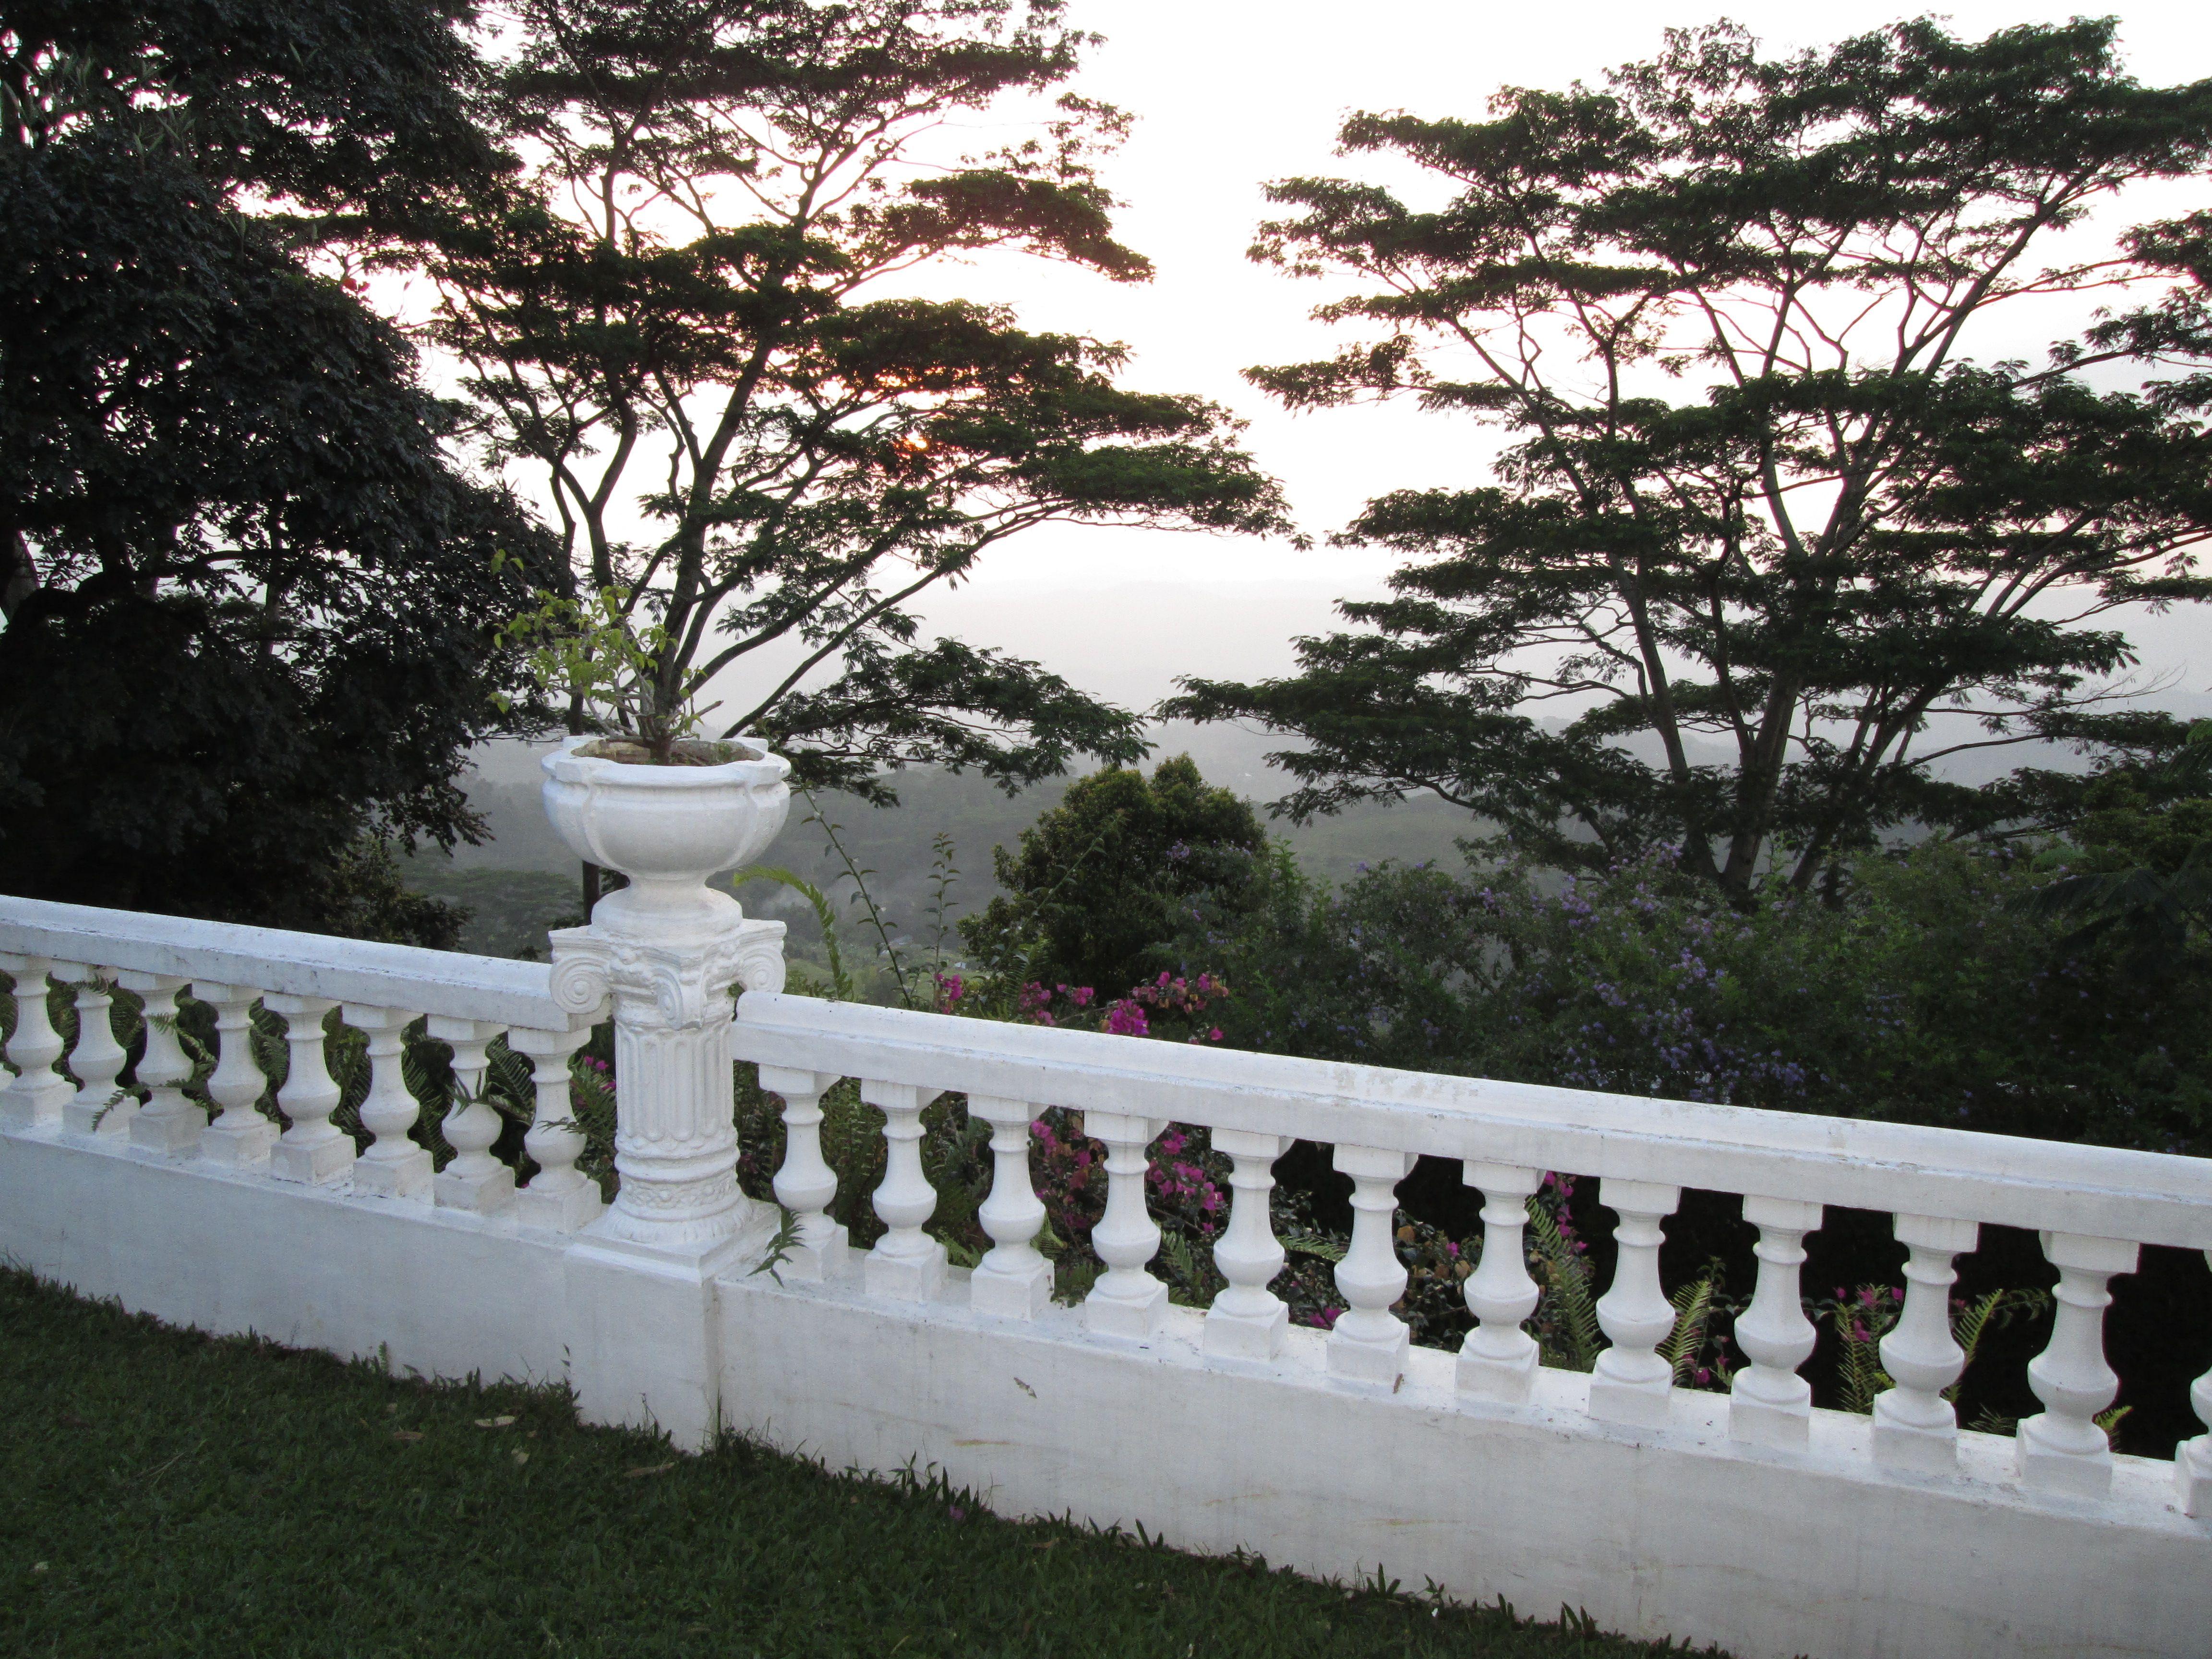 Elkaduwa, Sri Lanka (With images)